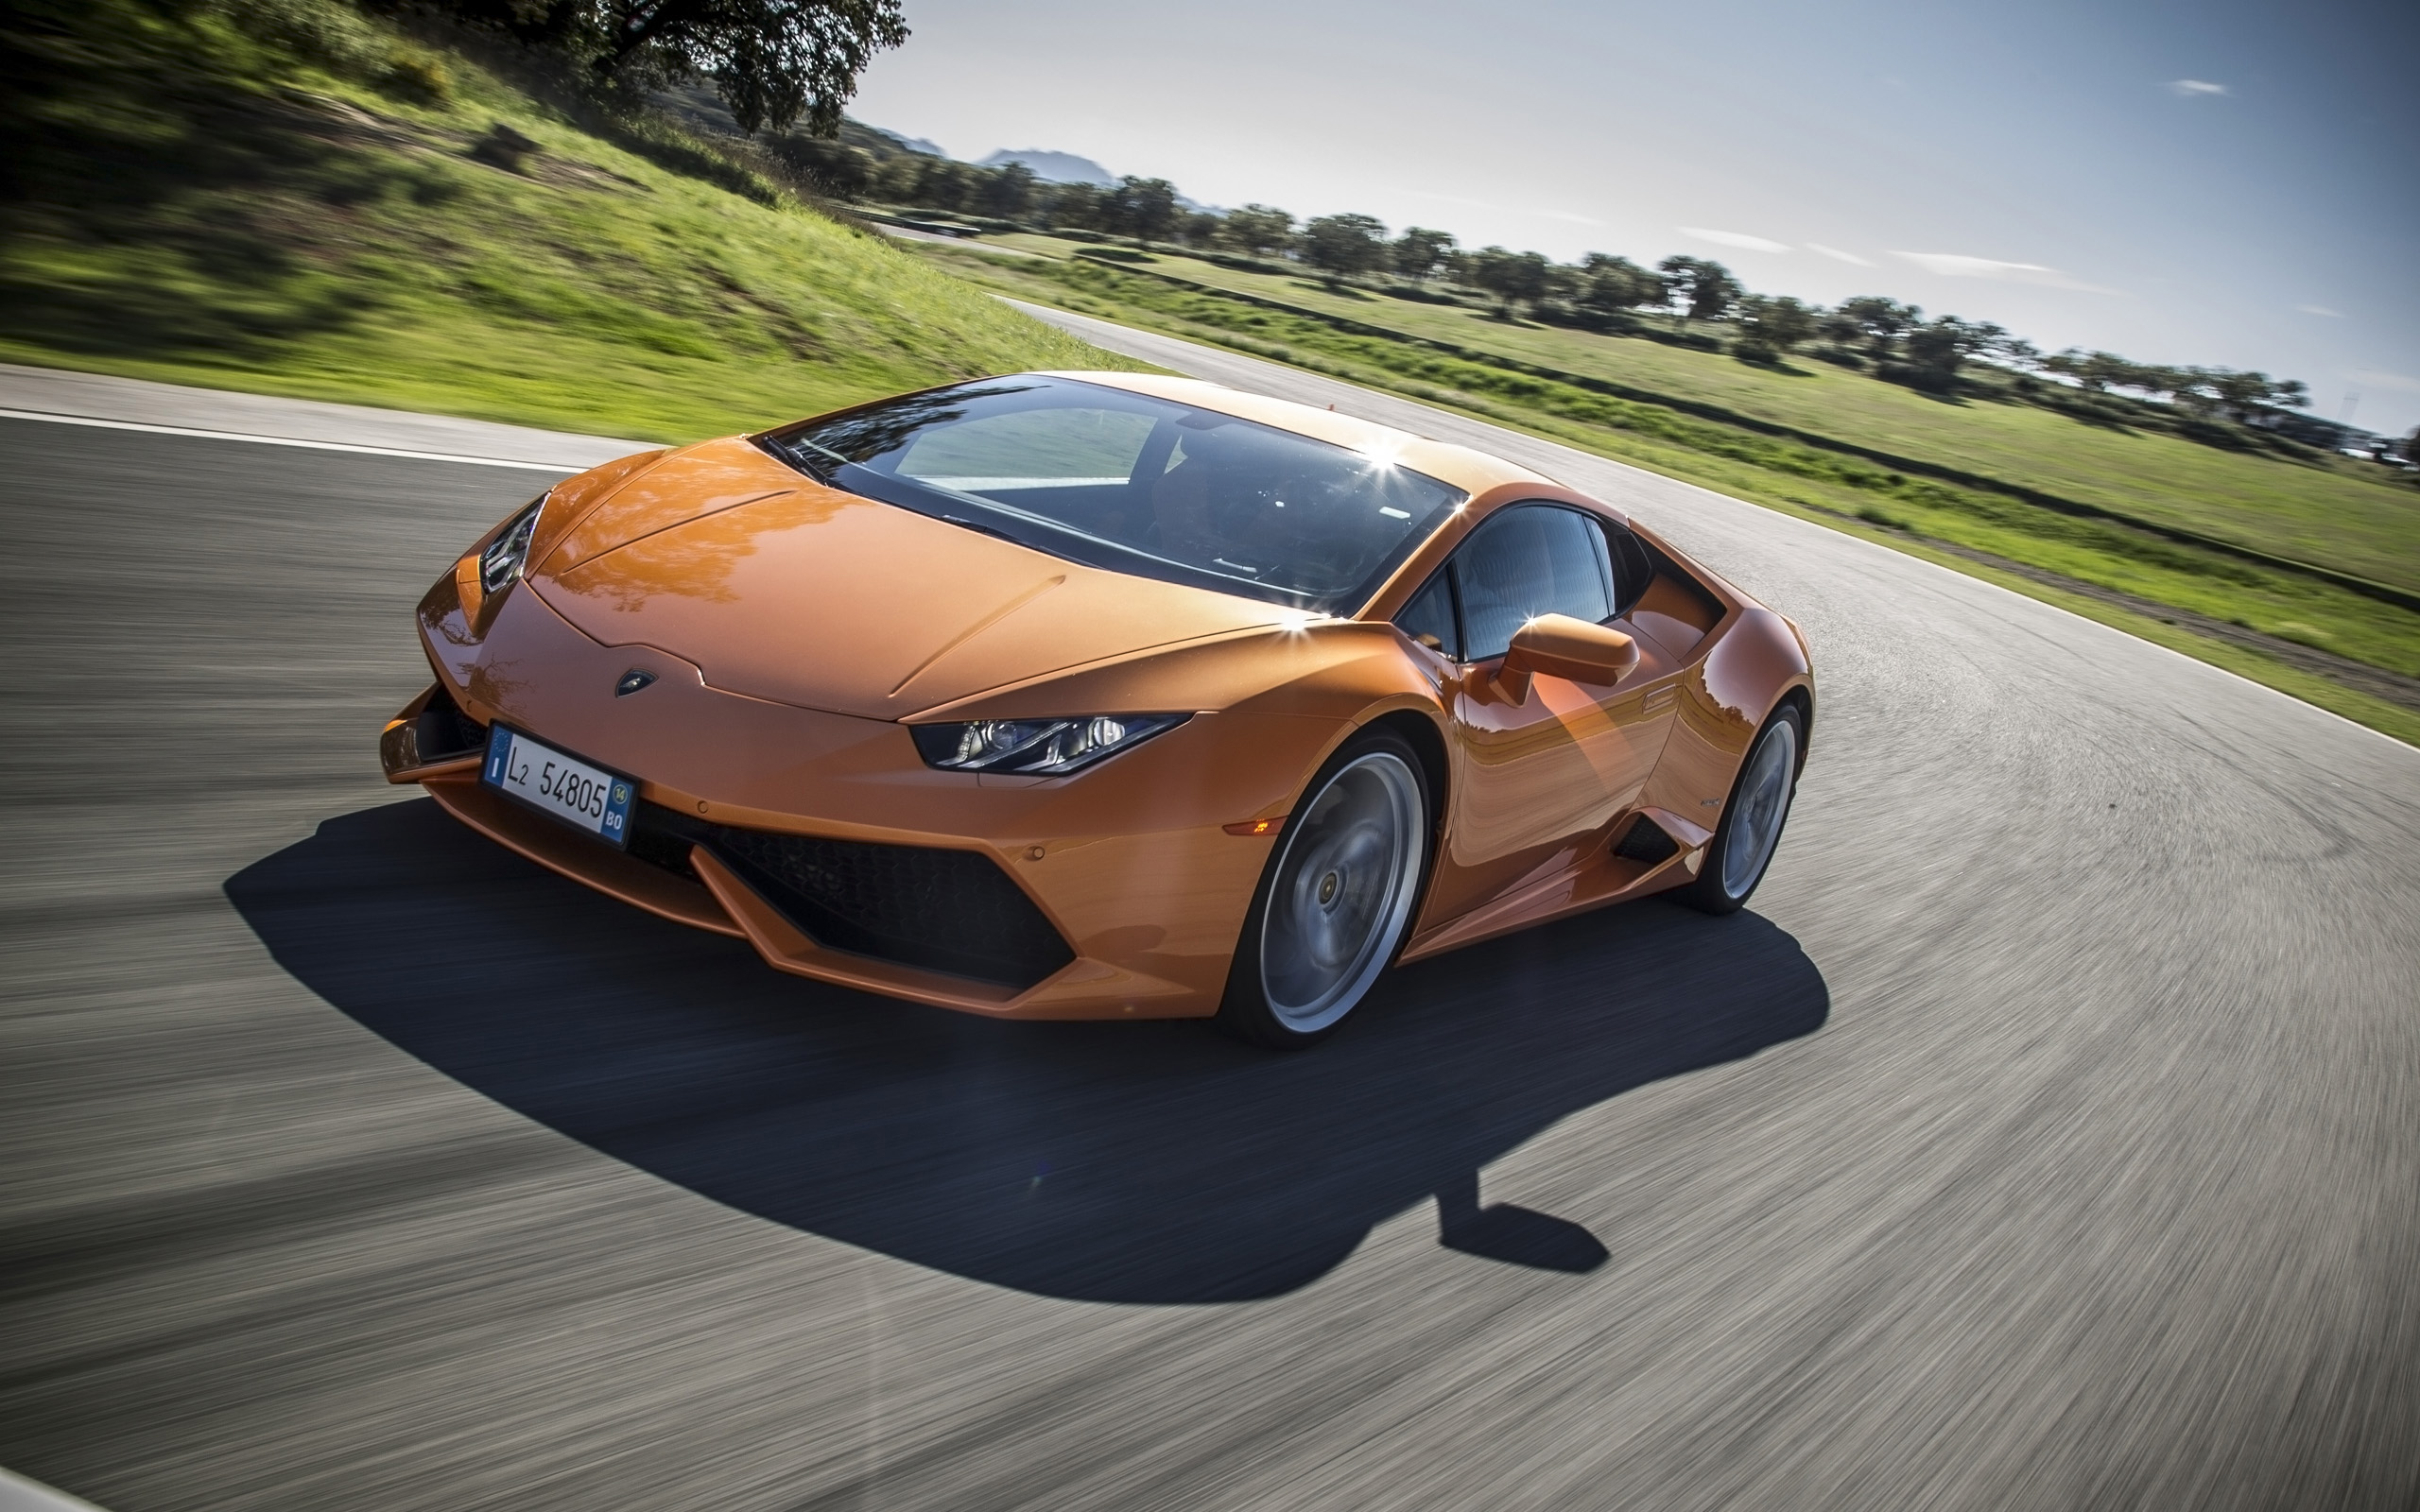 Lamborghini Huracan HD Wallpaper Background Image 2560x1600 2560x1600